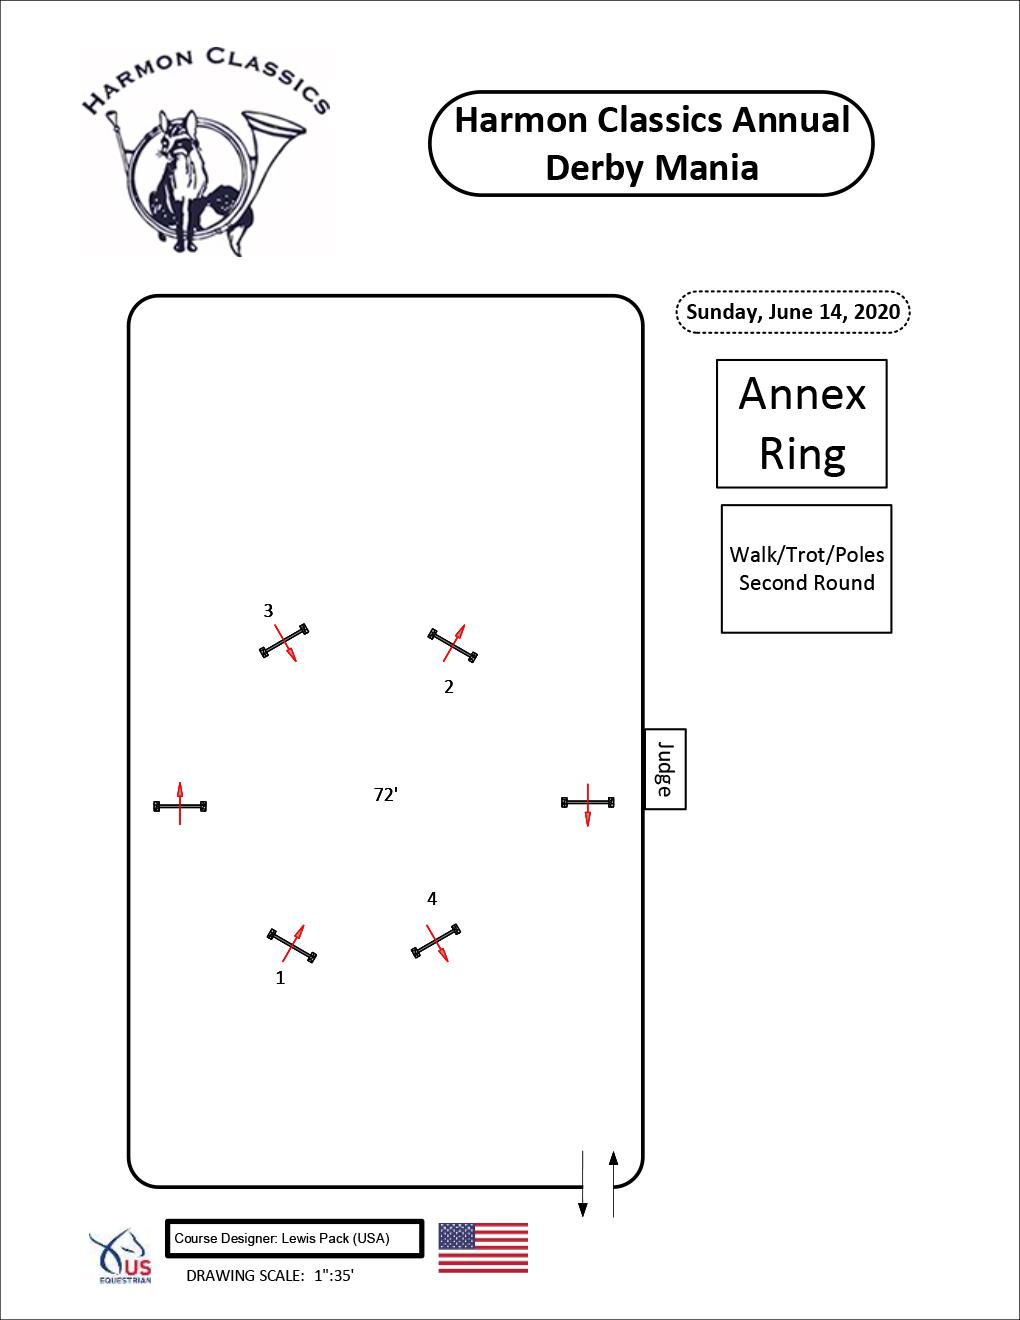 Annex-Ring-Sunday6-14-Walk-Trot-Poles-Second-Round-Harmon-Classics-Derby-Mania